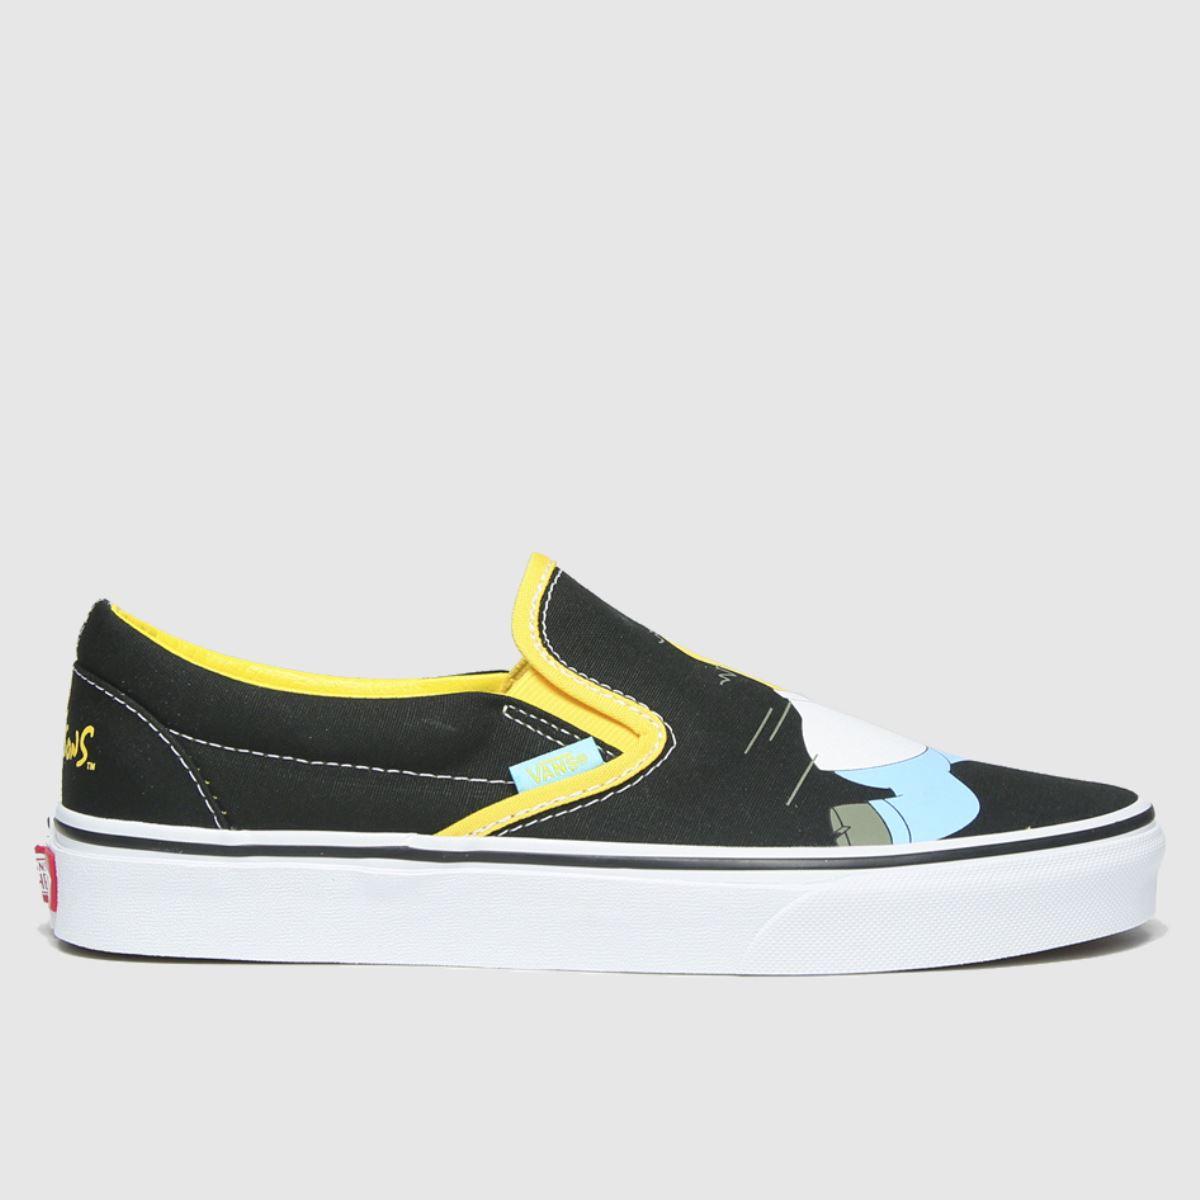 Vans Black & White Classic Slip-on Simpsons Trainers